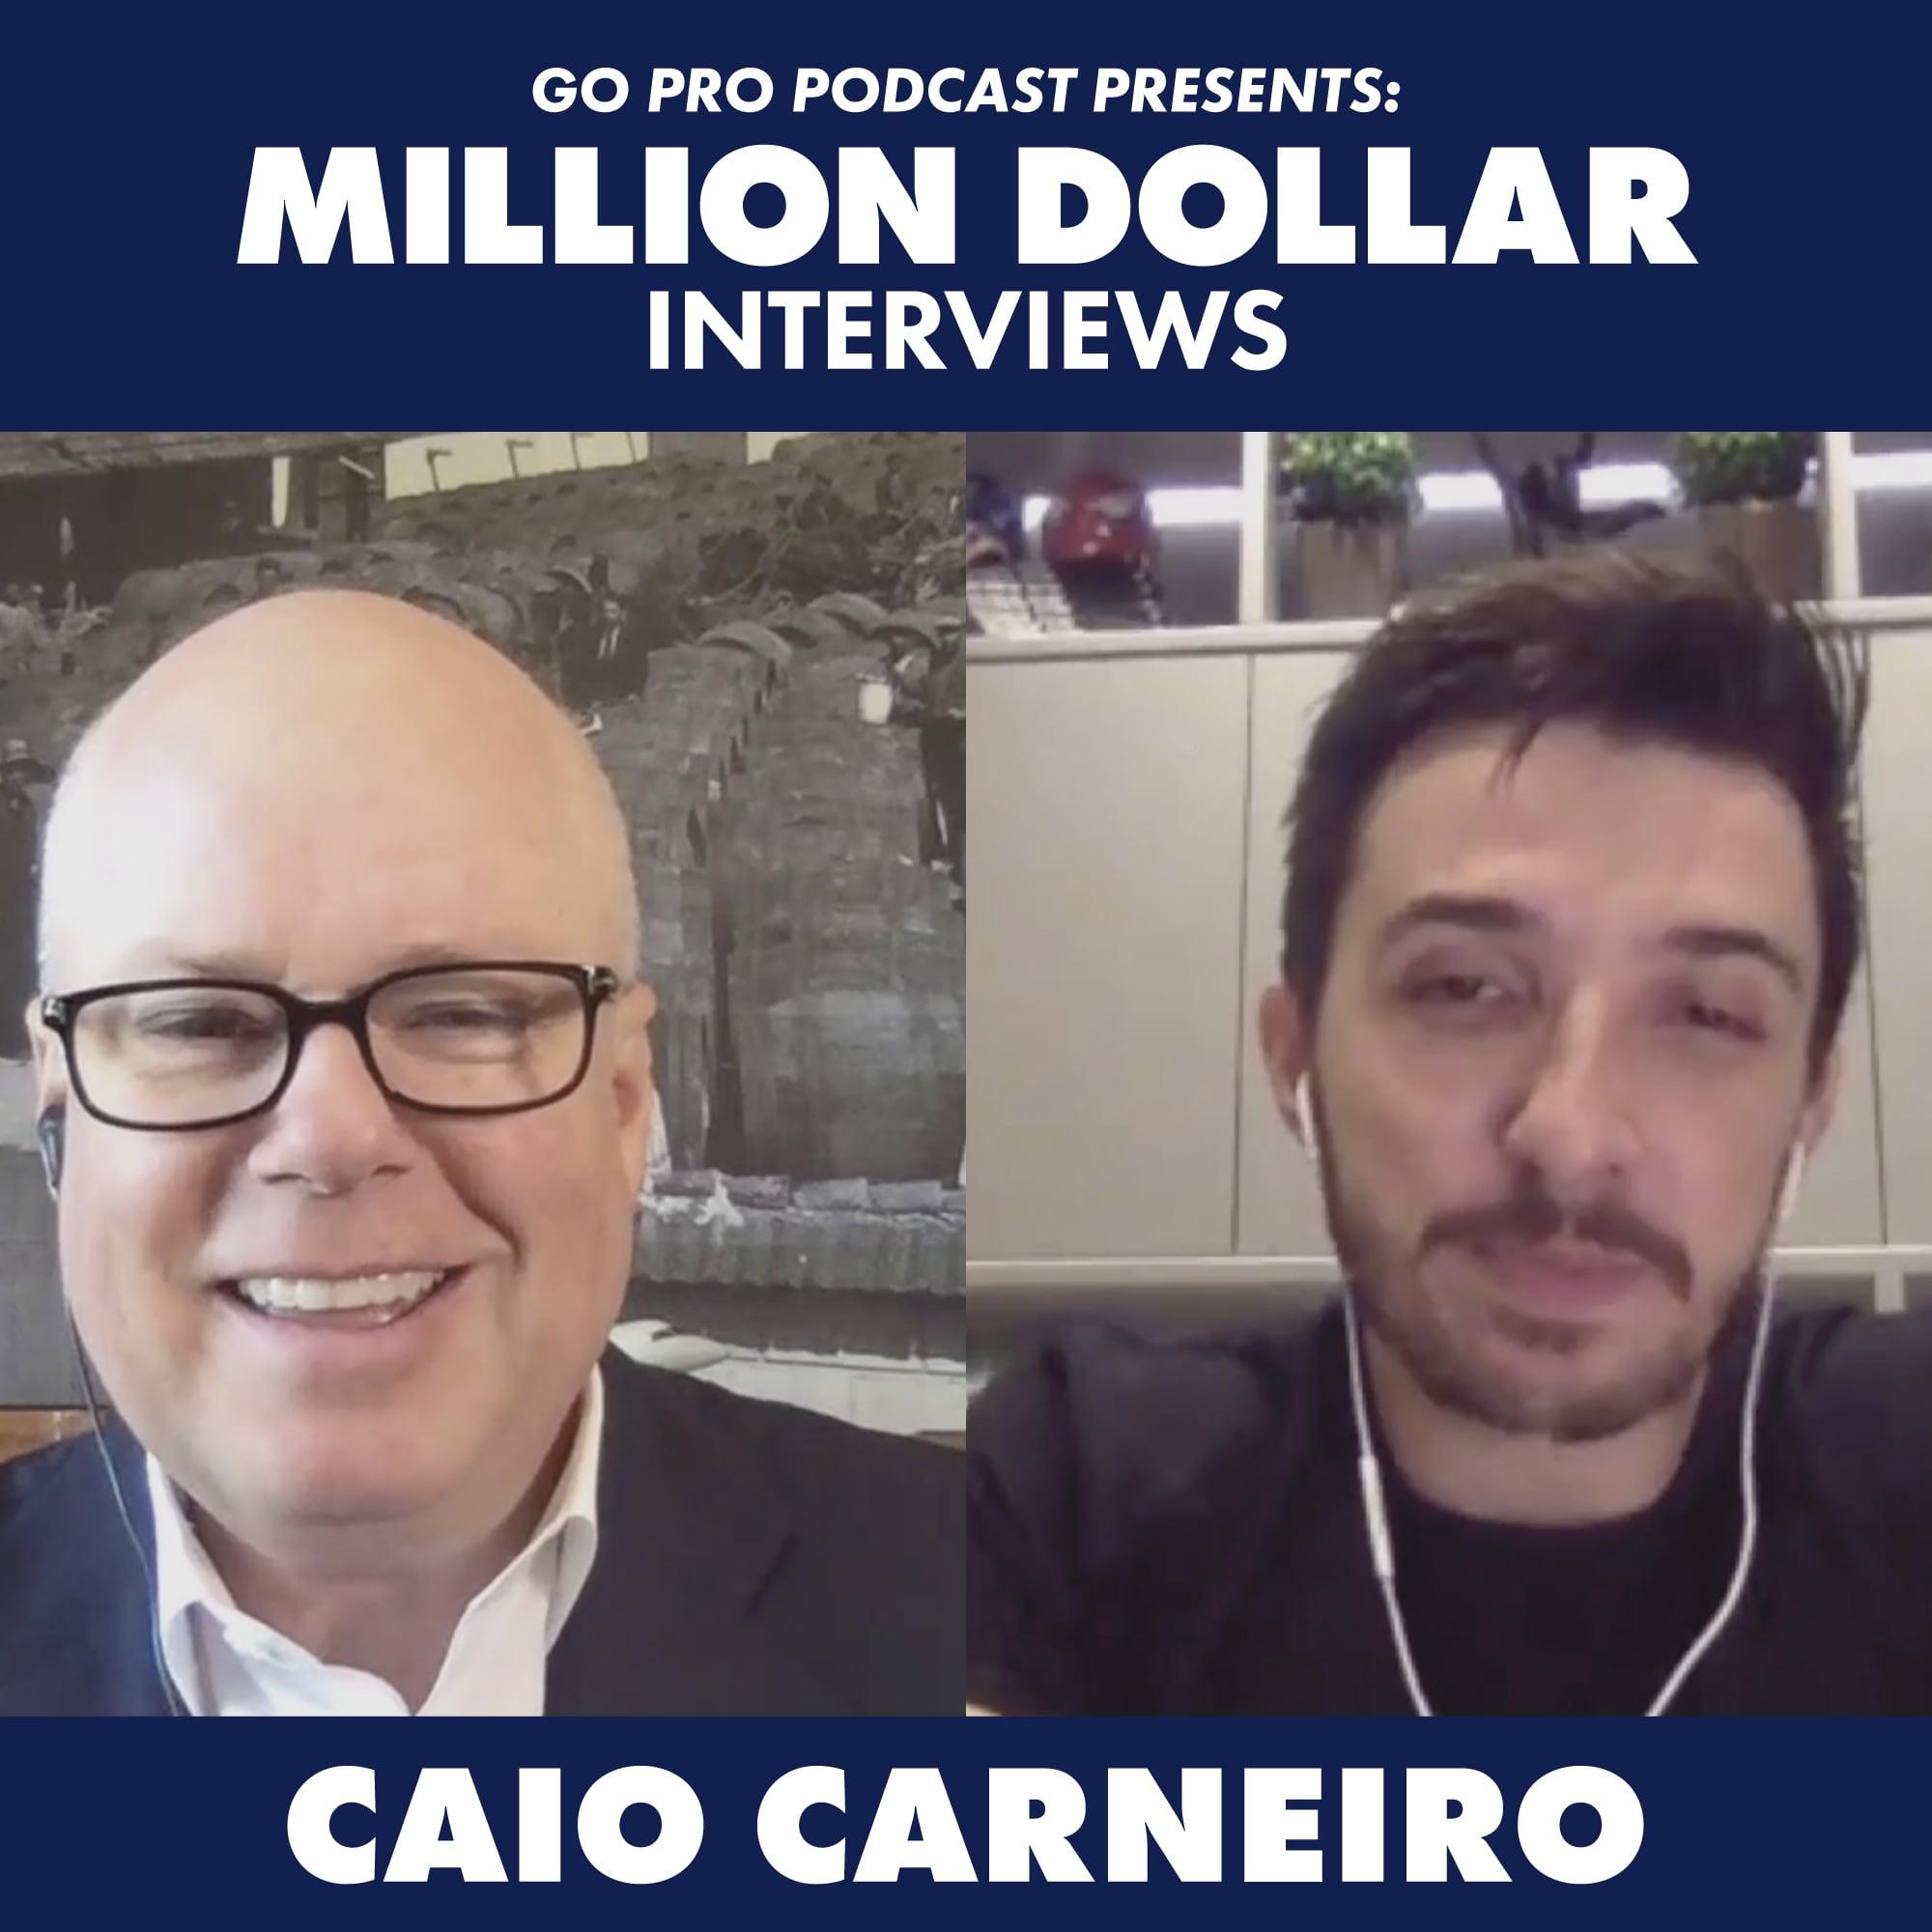 Caio Carneiro: Million Dollar Interview